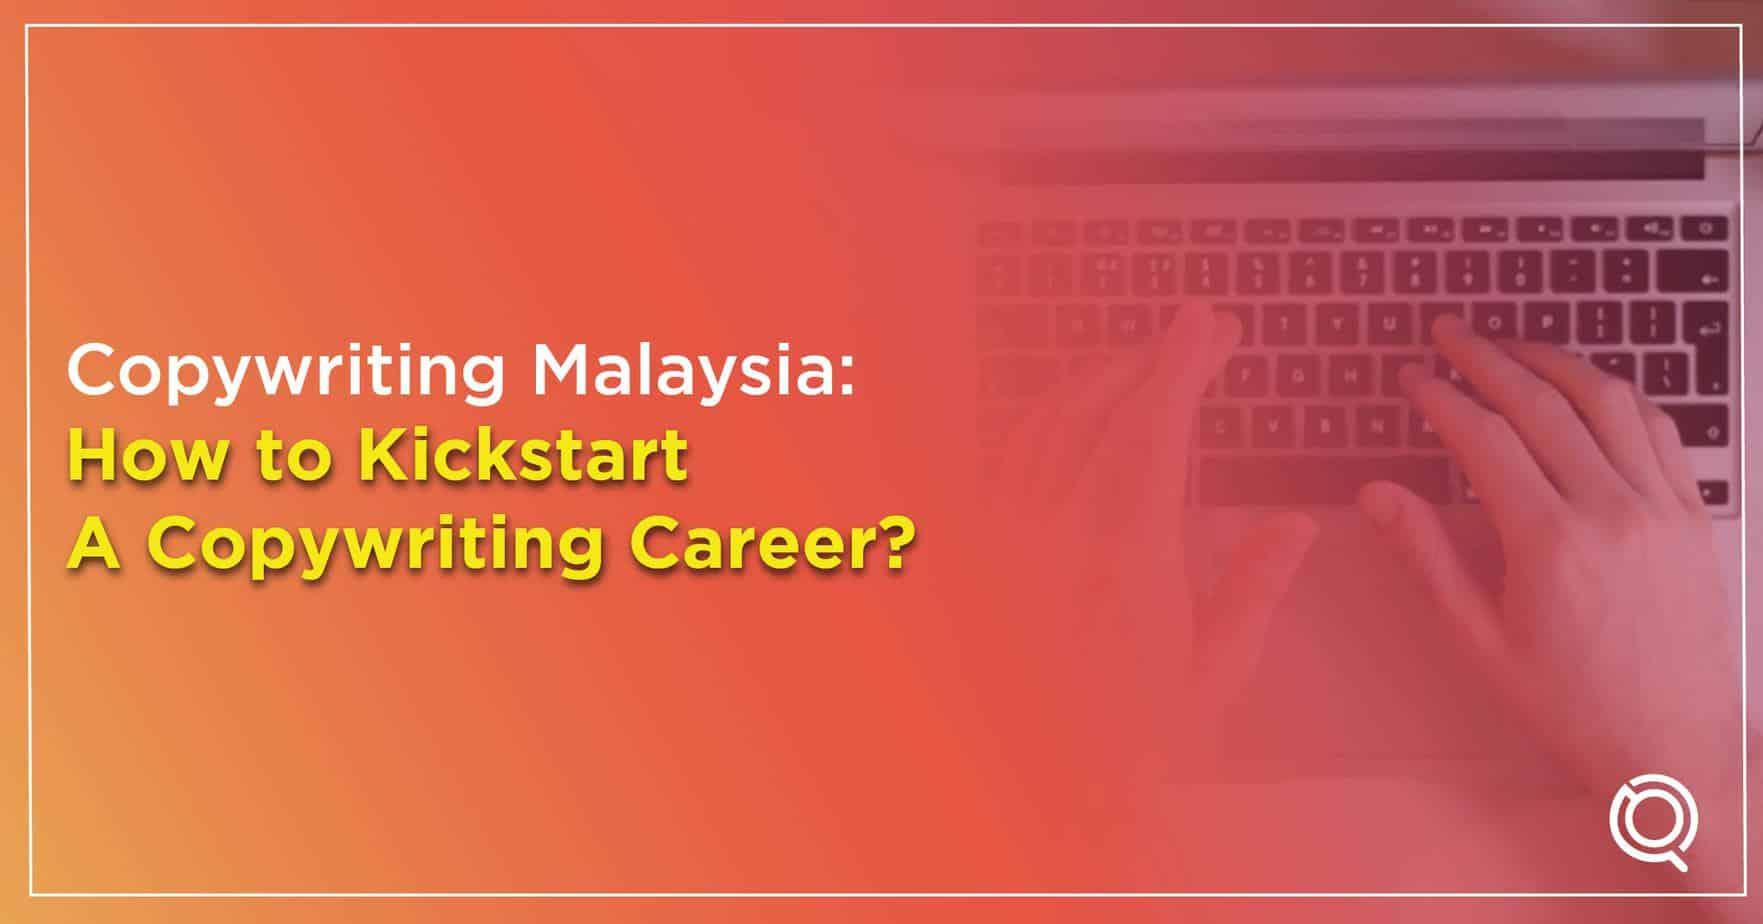 Copywriting Malaysia - One Search Pro Digital Marketing Agency in Malaysia - Trusted SEO Agency in Malaysia